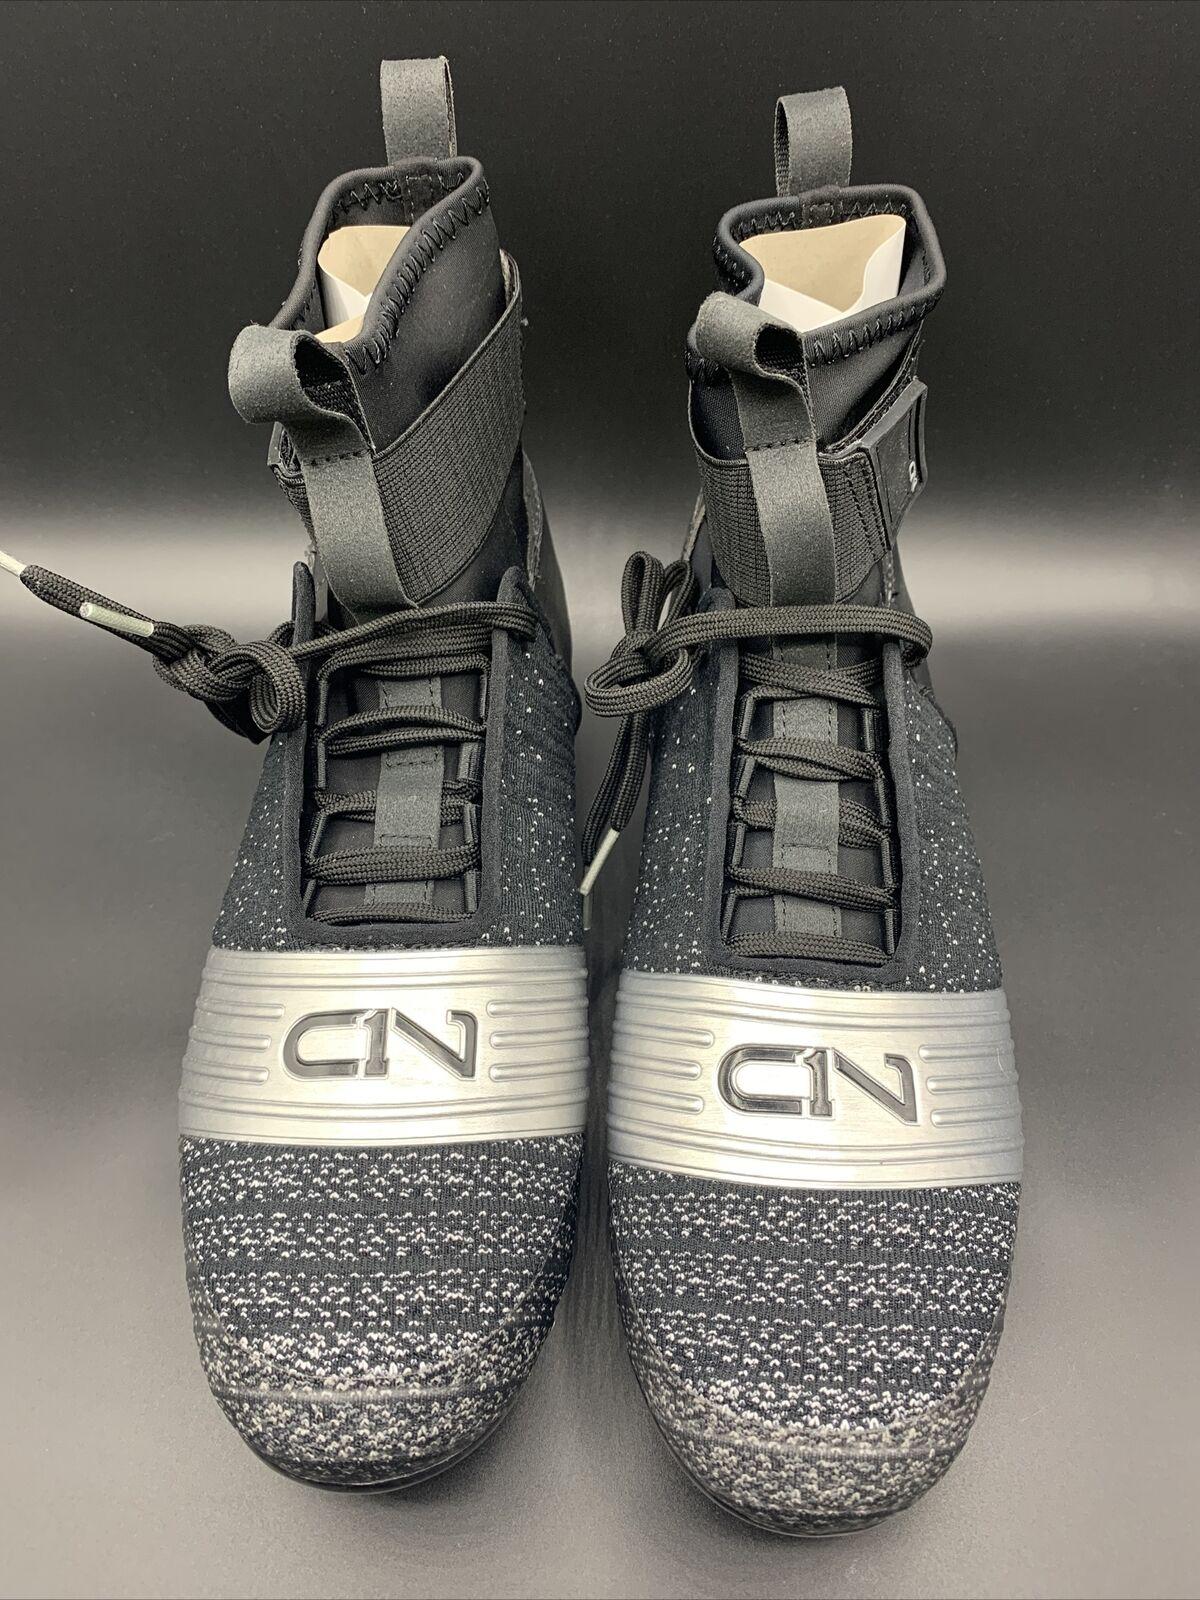 New W//Box Under Armour C1N MC Cam Newton High Football Cleats Black//Silver $160